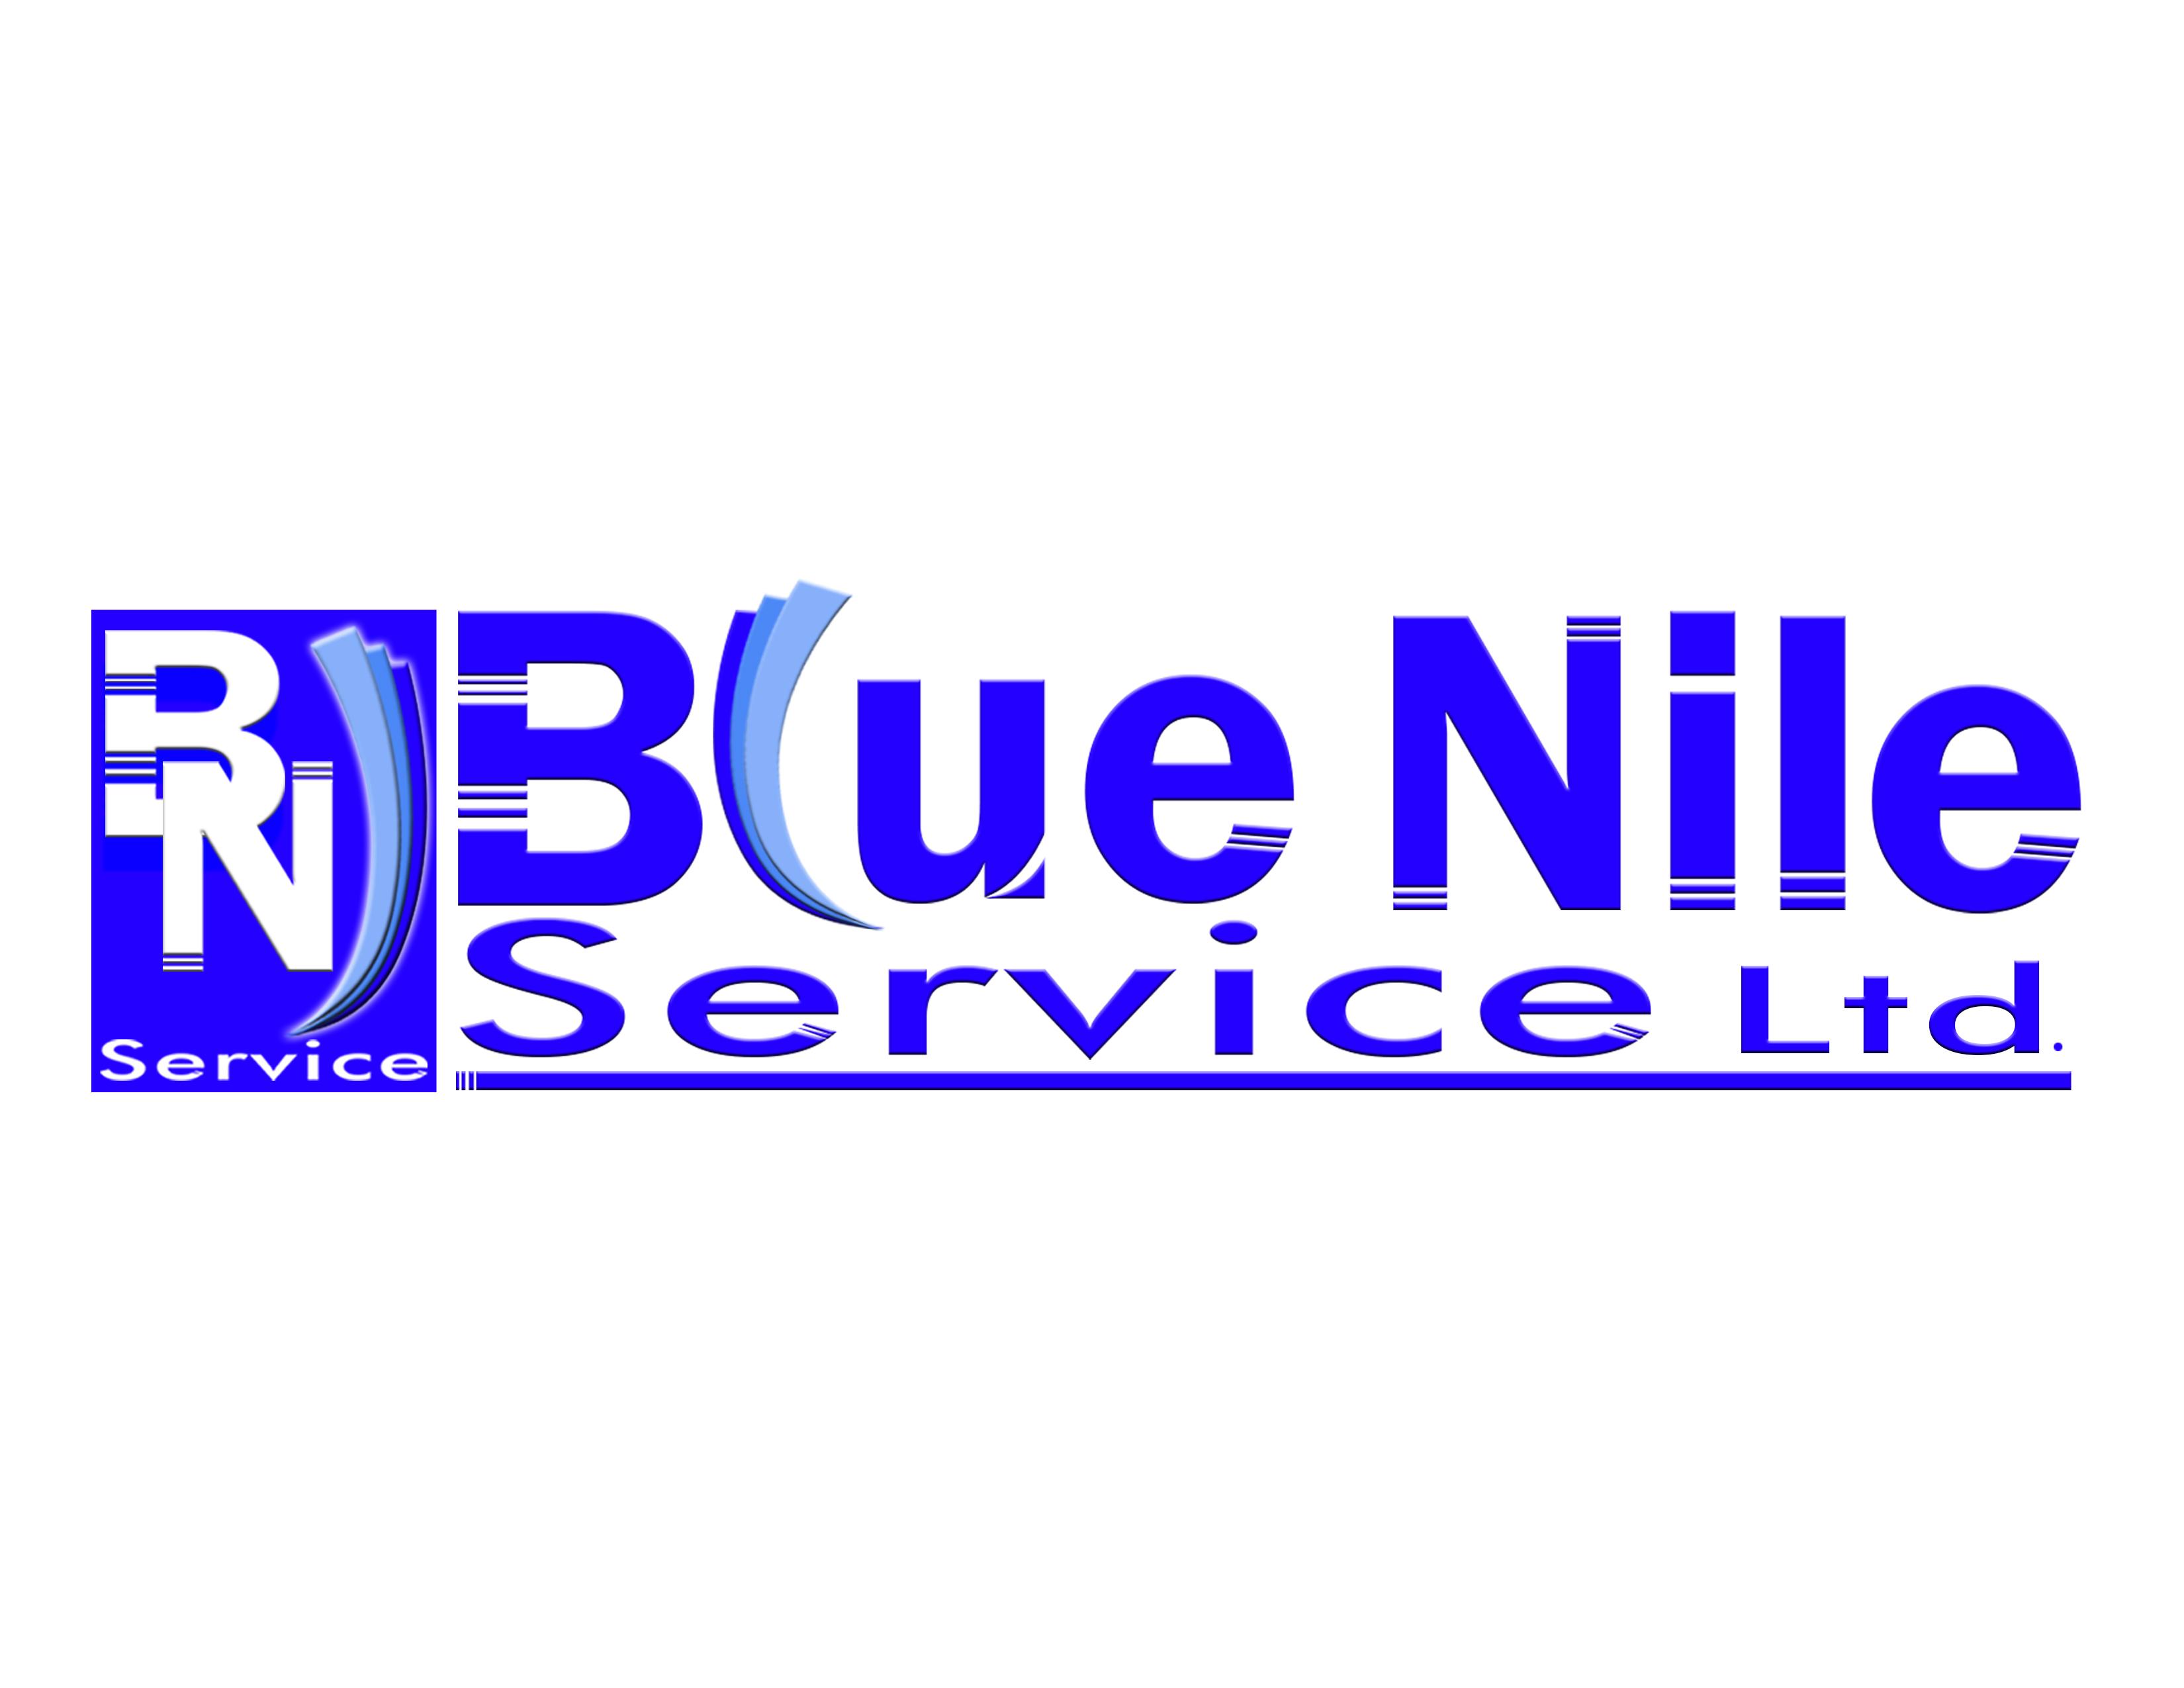 Logo Design by Jo Cres Jao - Entry No. 15 in the Logo Design Contest Imaginative Logo Design for Blue Nile Service Ltd.